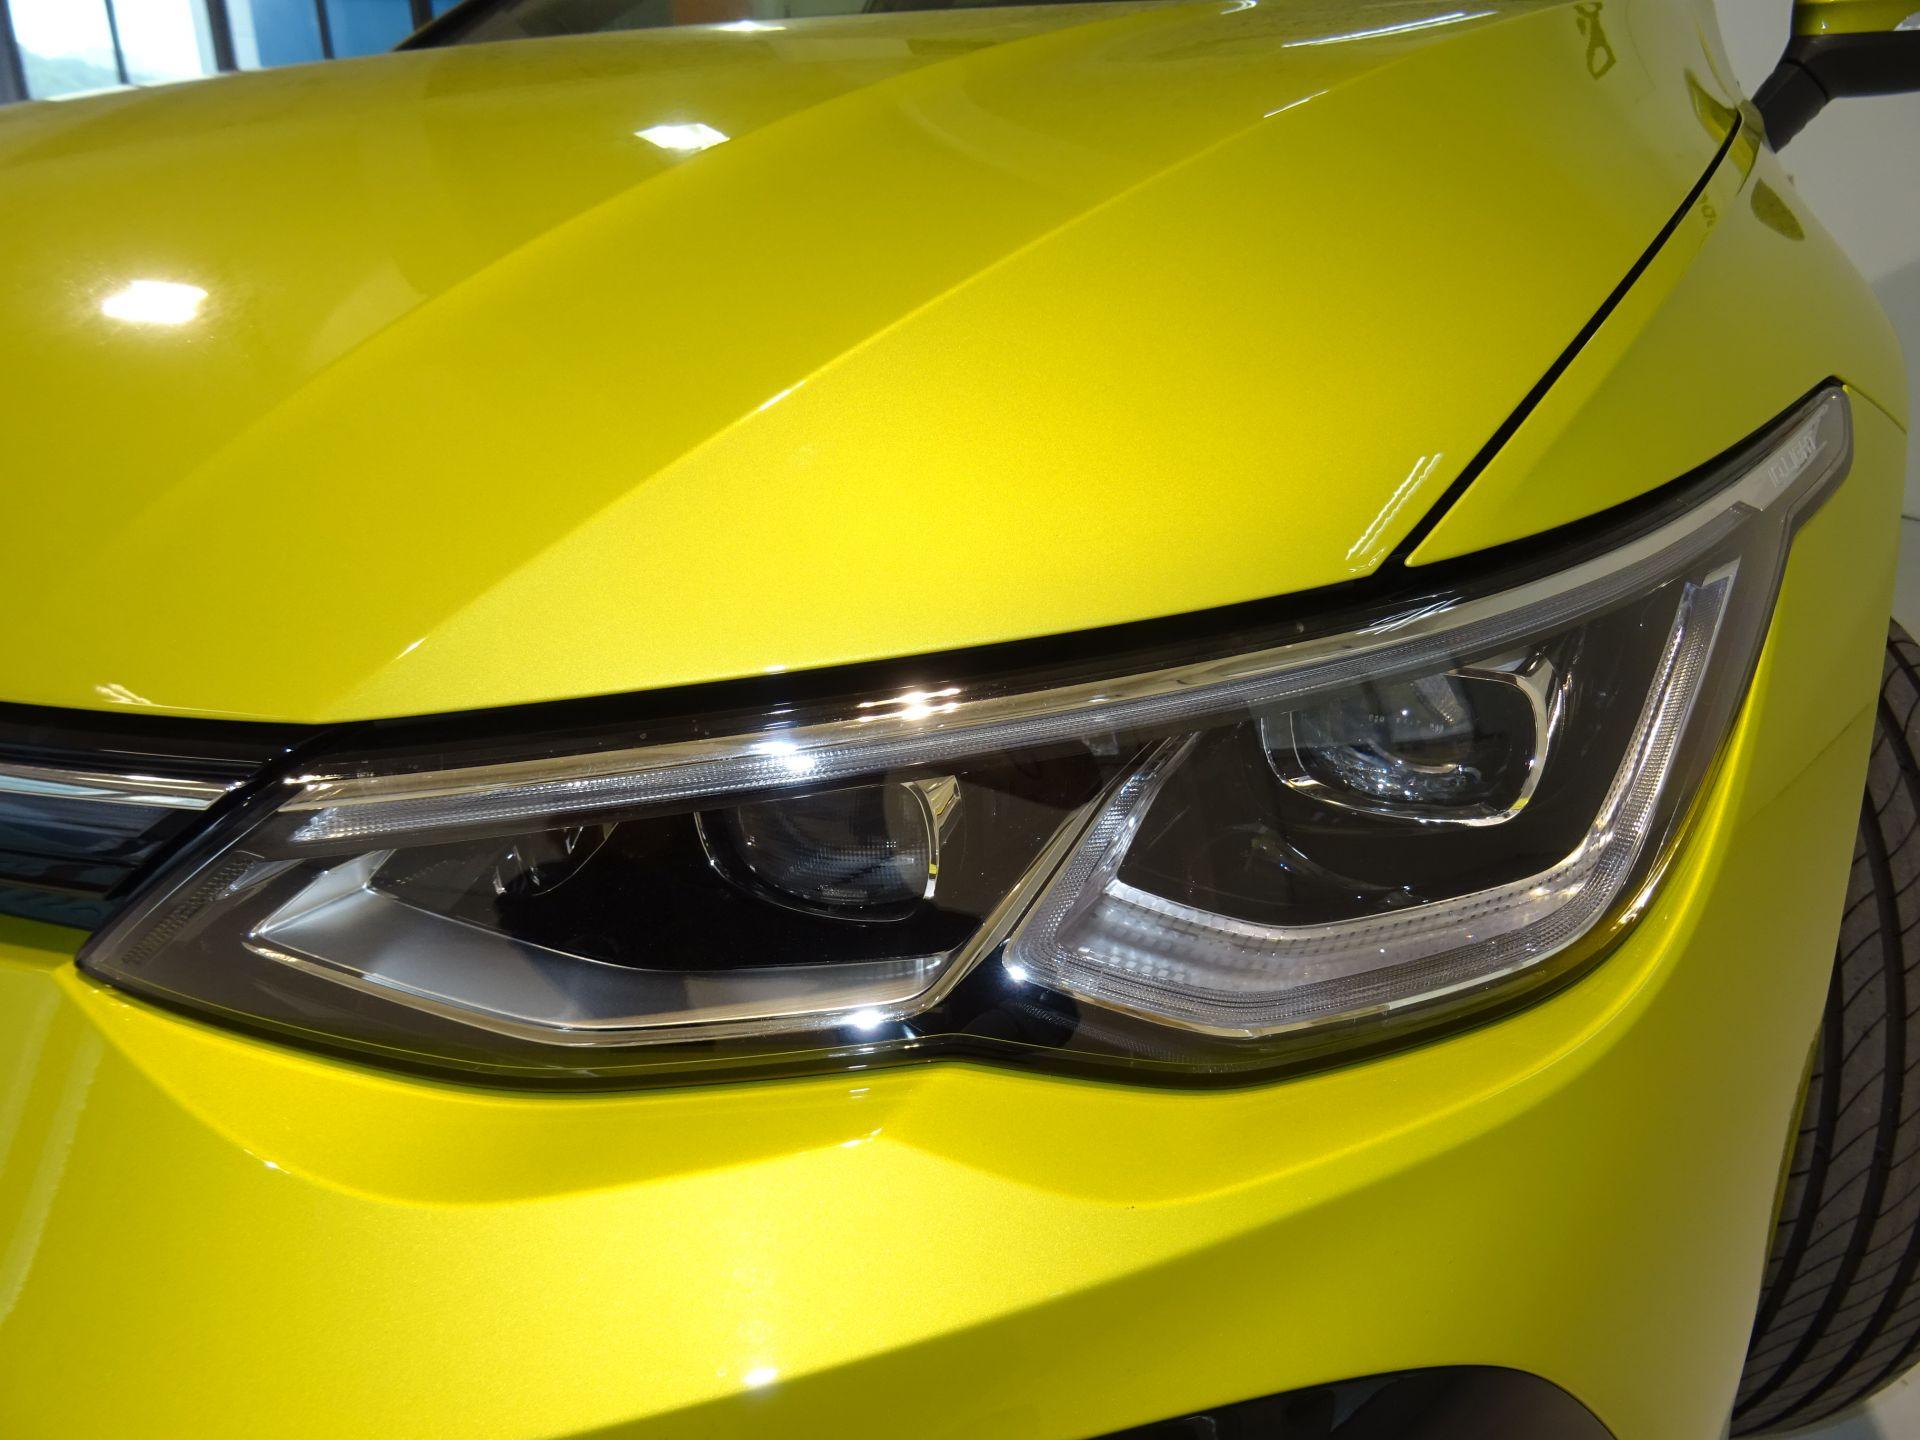 Volkswagen Golf R-Line 2.0 TDI 110kW (150CV) DSG